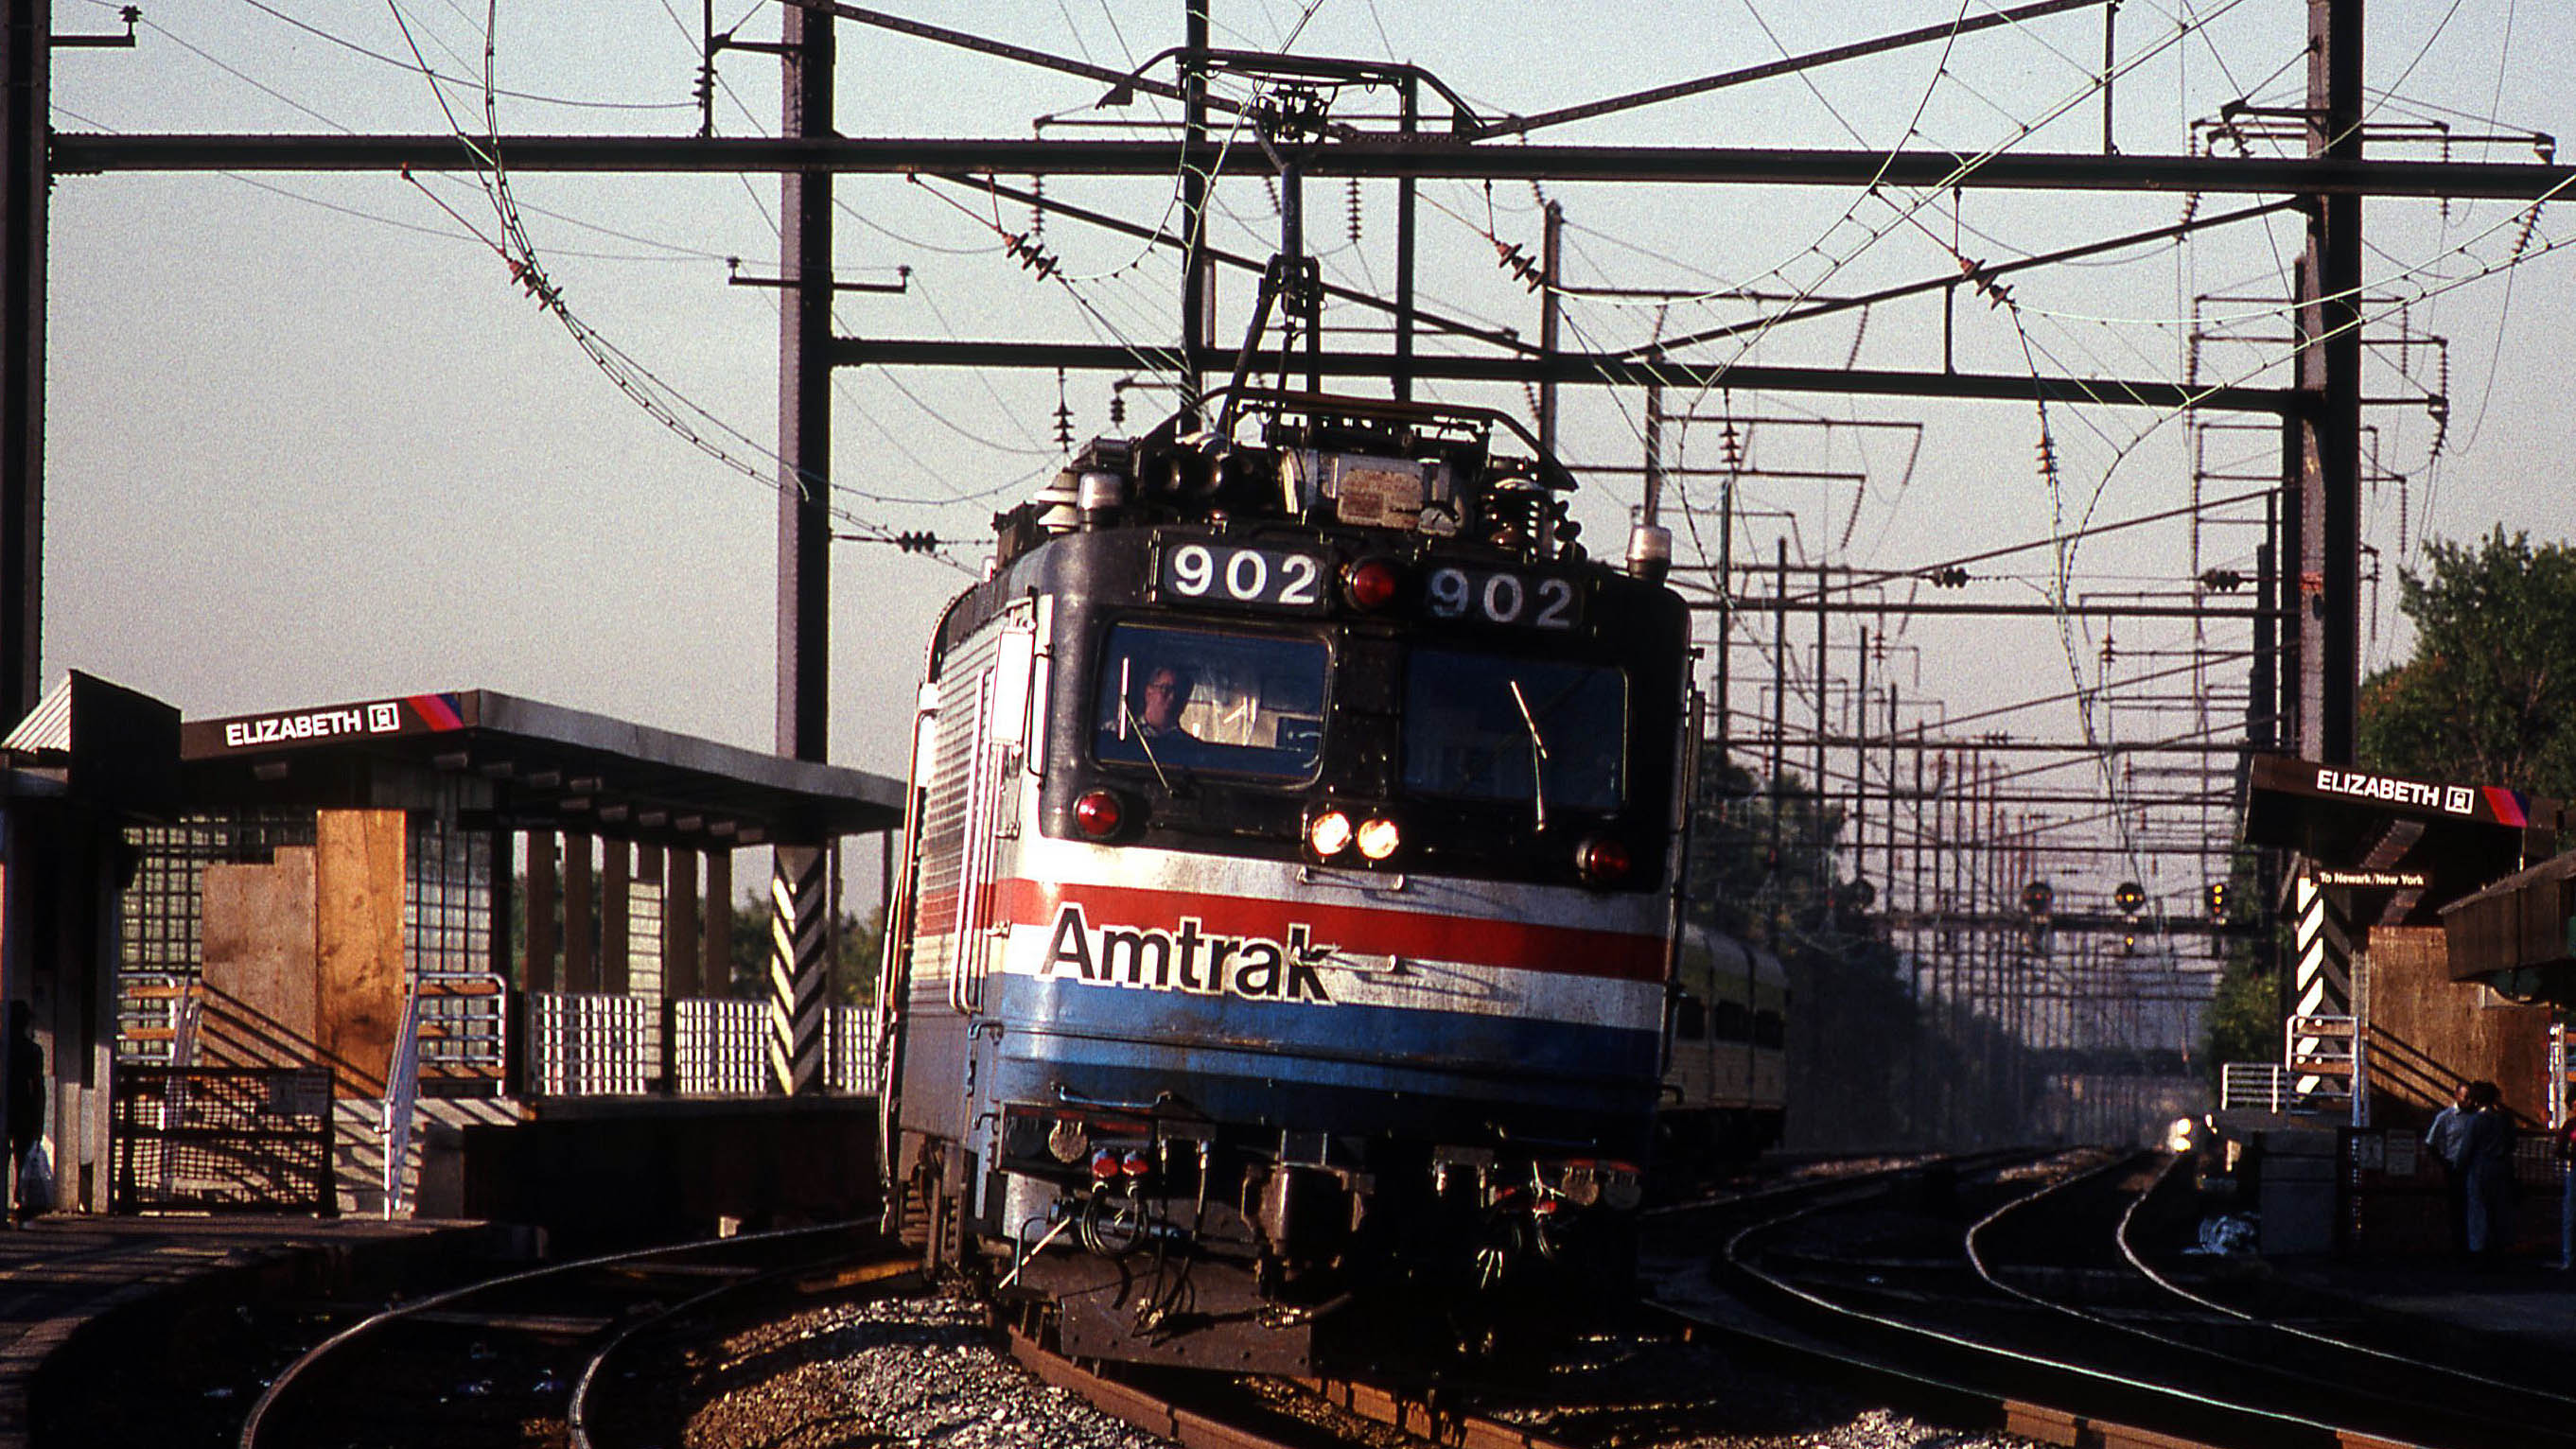 EMD-AEM-7-Elizabeth-Amtrak-Gary-Dolzall